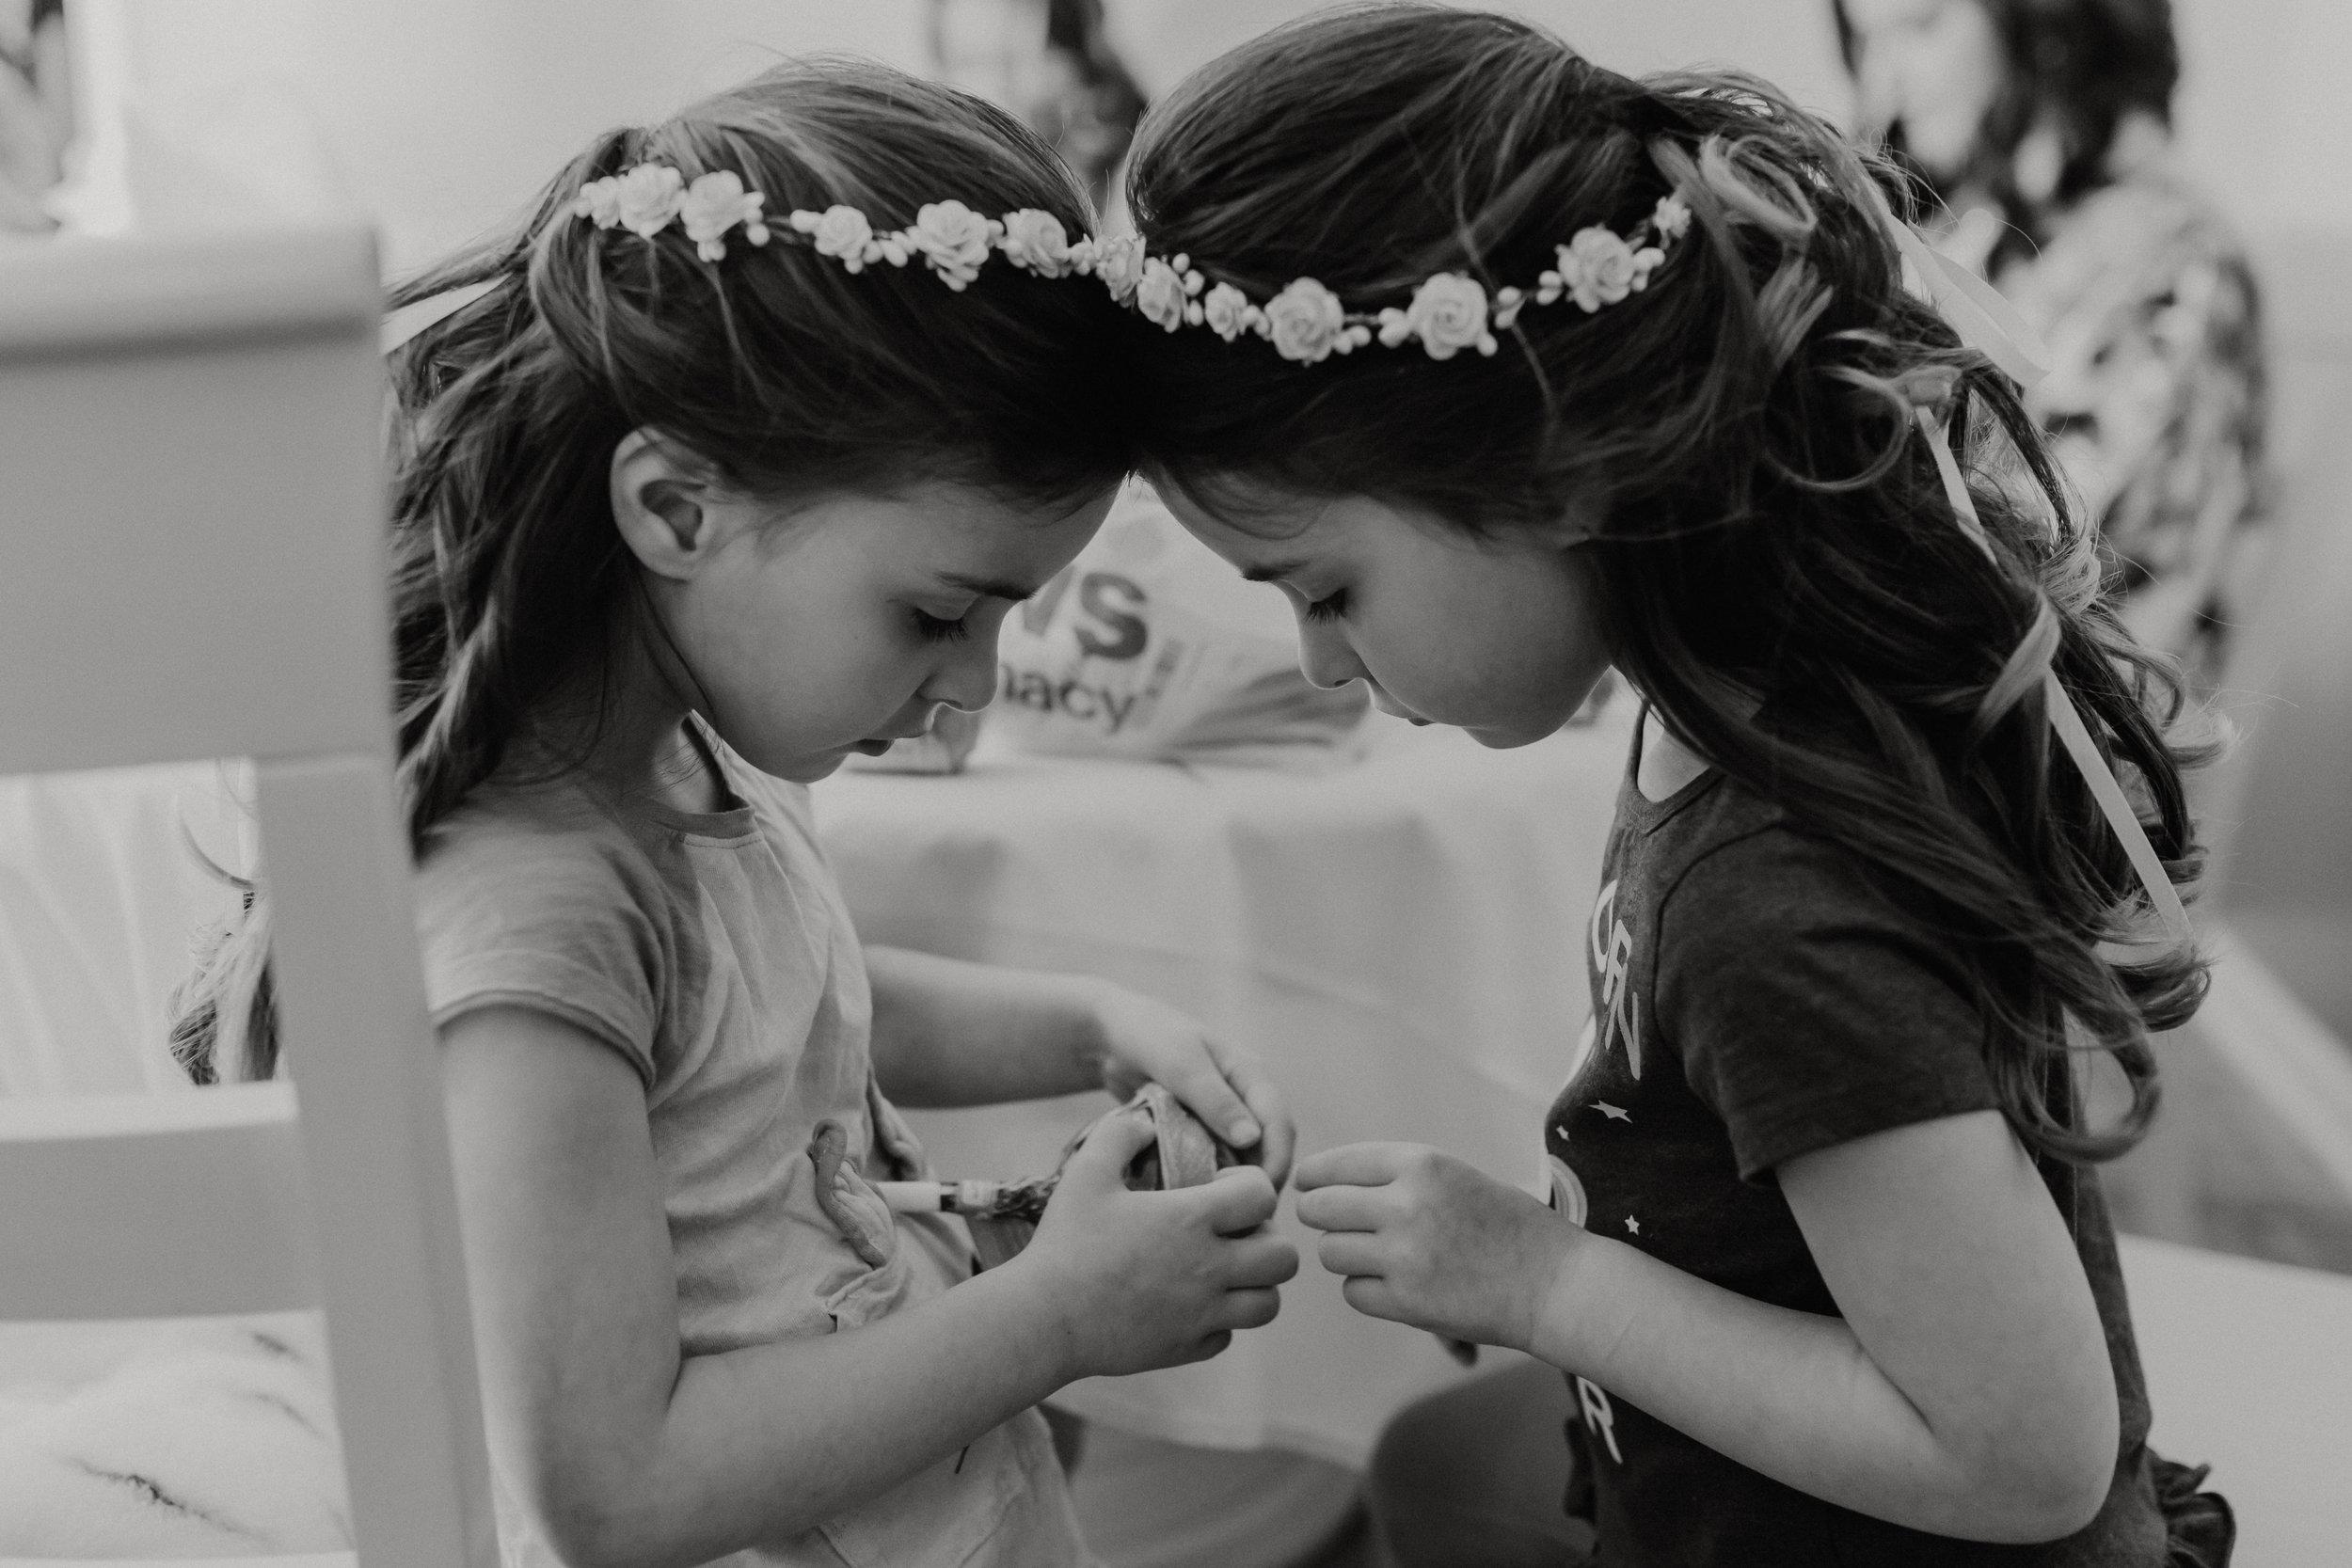 albany-new-york-wedding-12.jpg